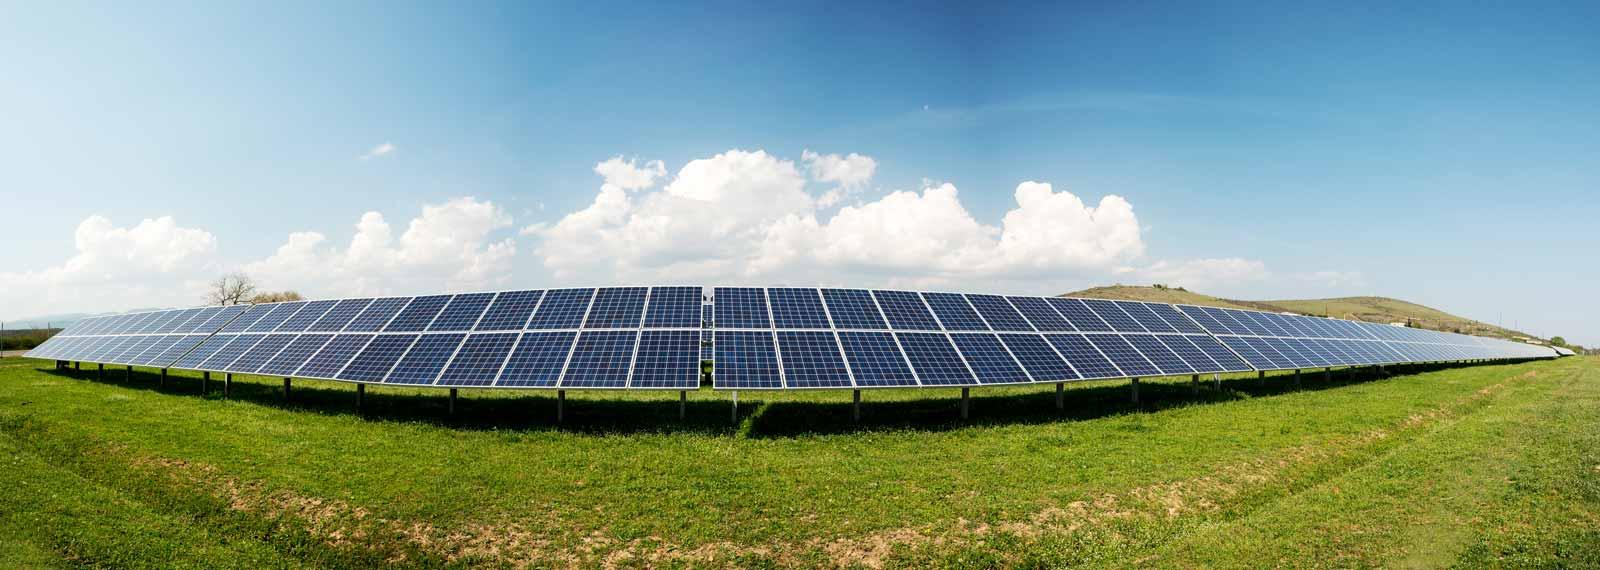 Photovoltaik-Direktinvestment